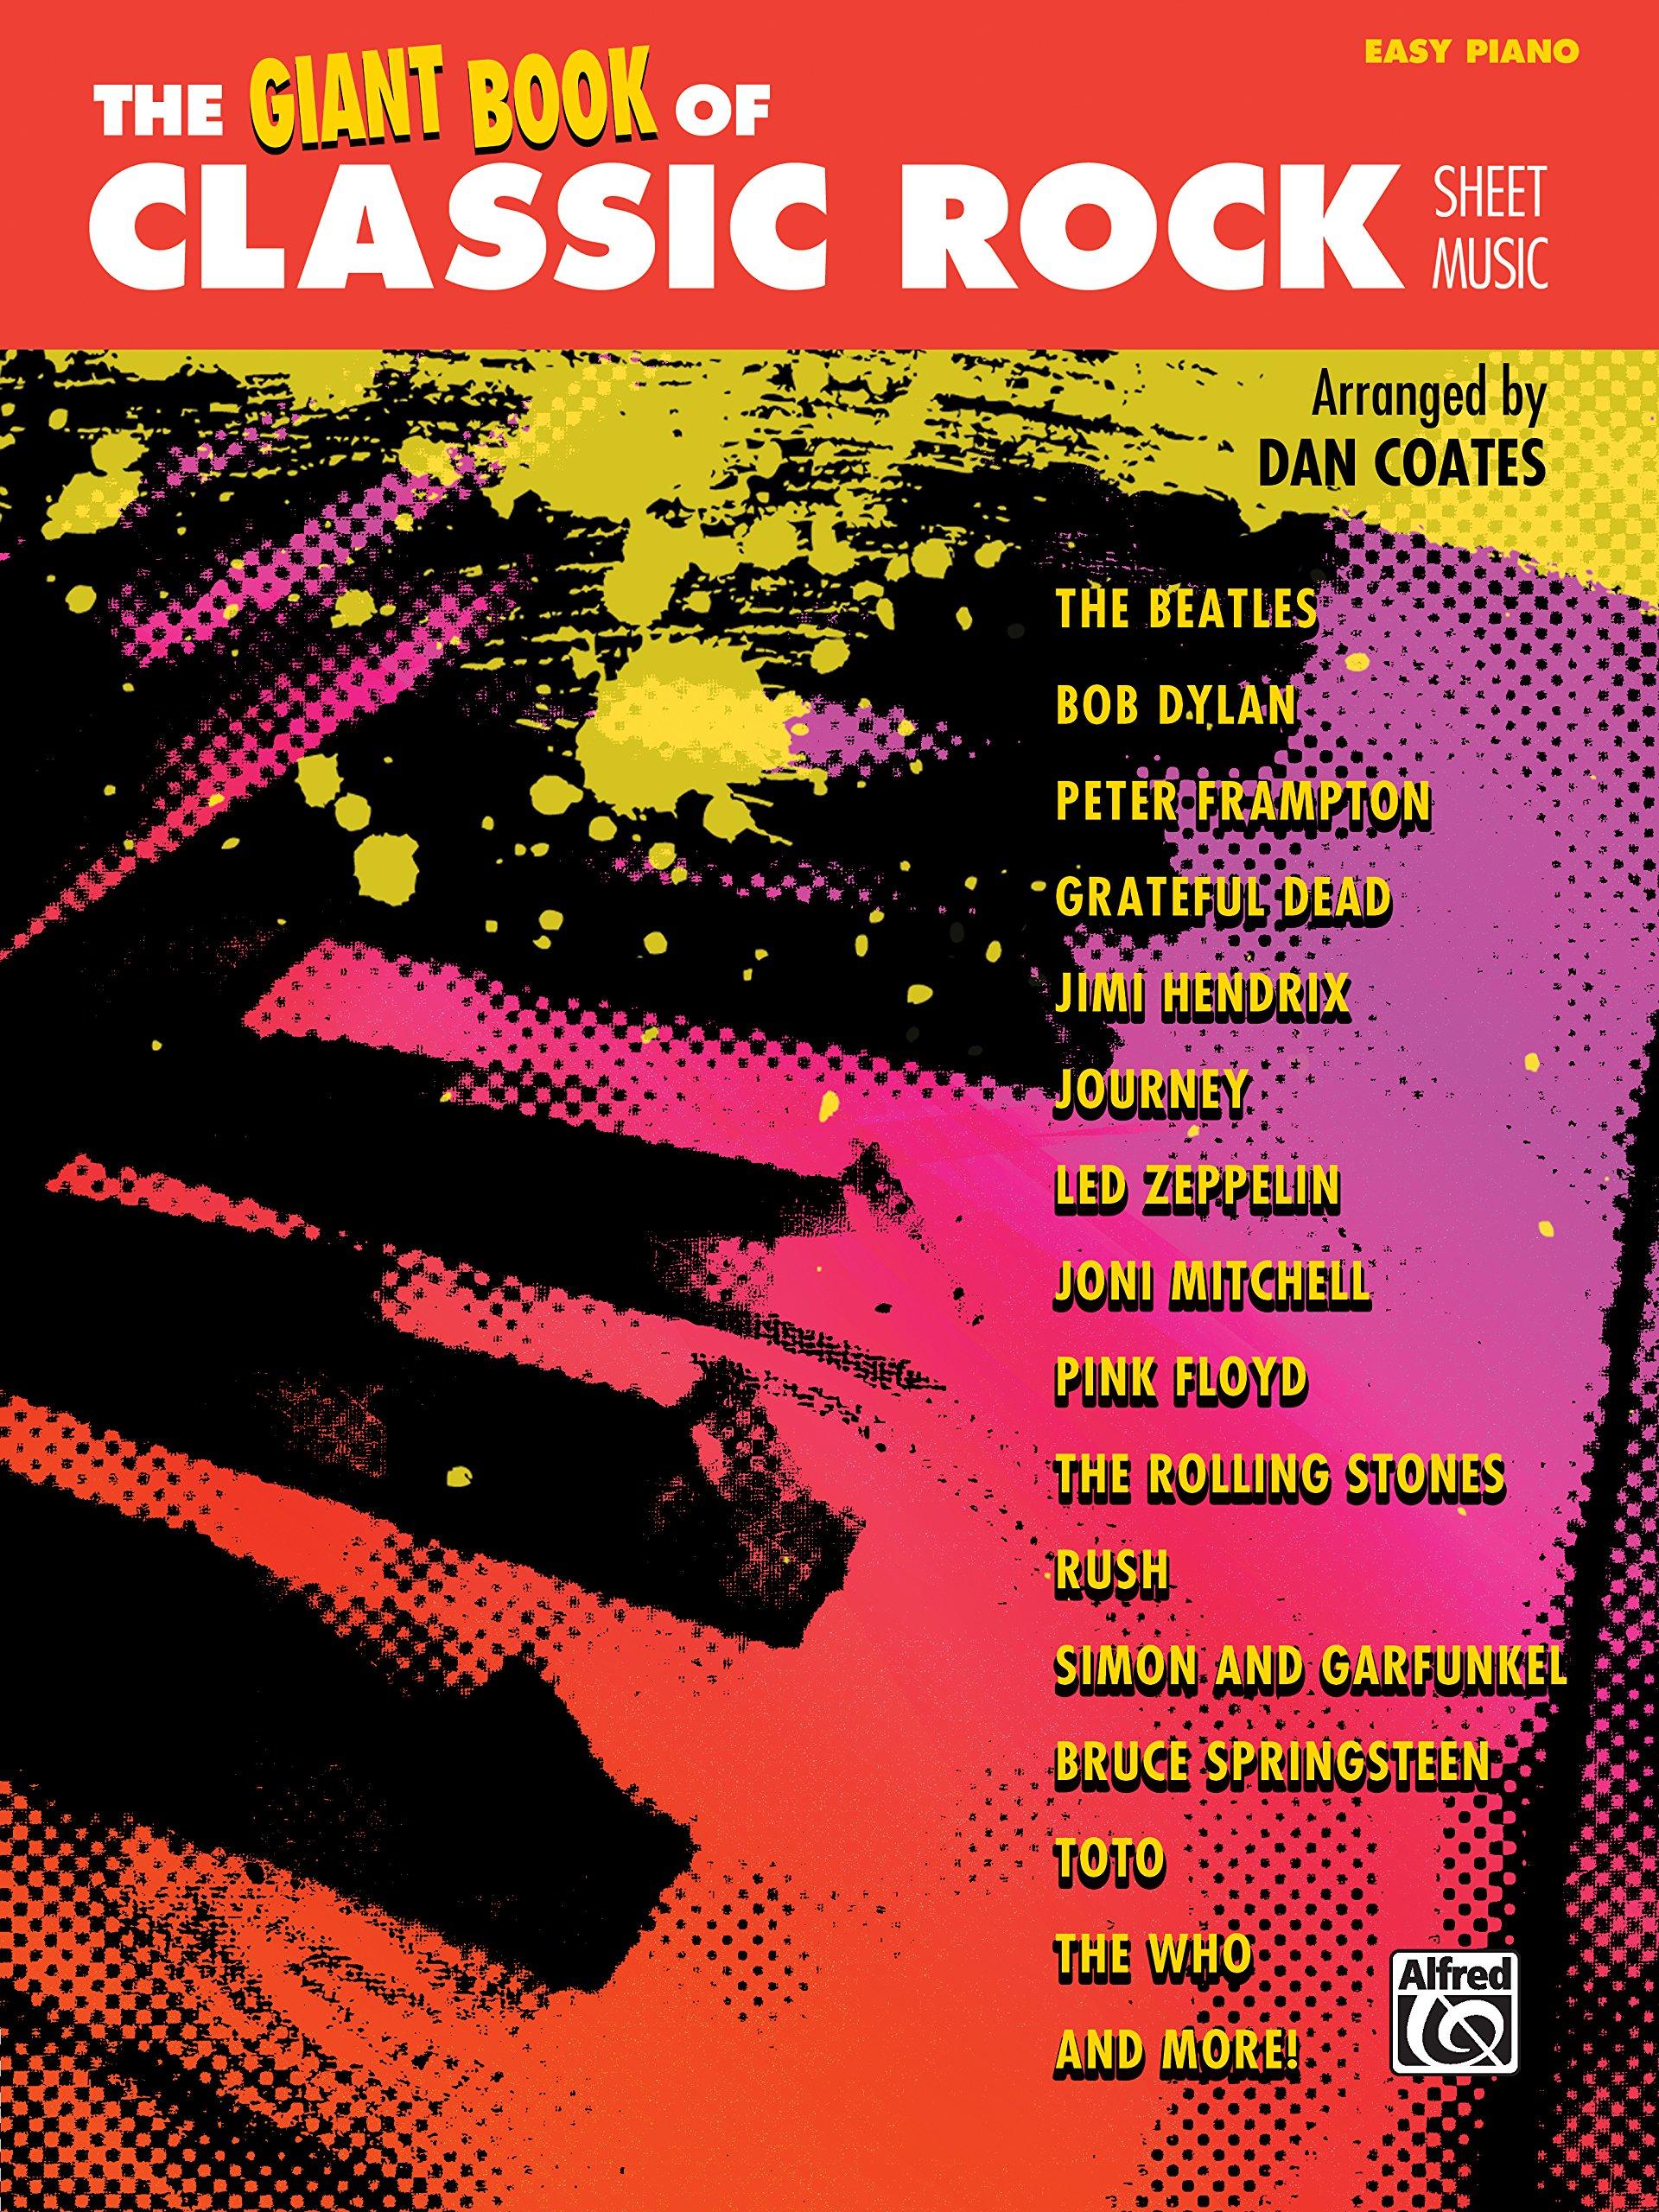 The giant book of classic rock sheet music easy piano the giant the giant book of classic rock sheet music easy piano the giant book of sheet music dan coates 0038081472126 amazon books fandeluxe Images